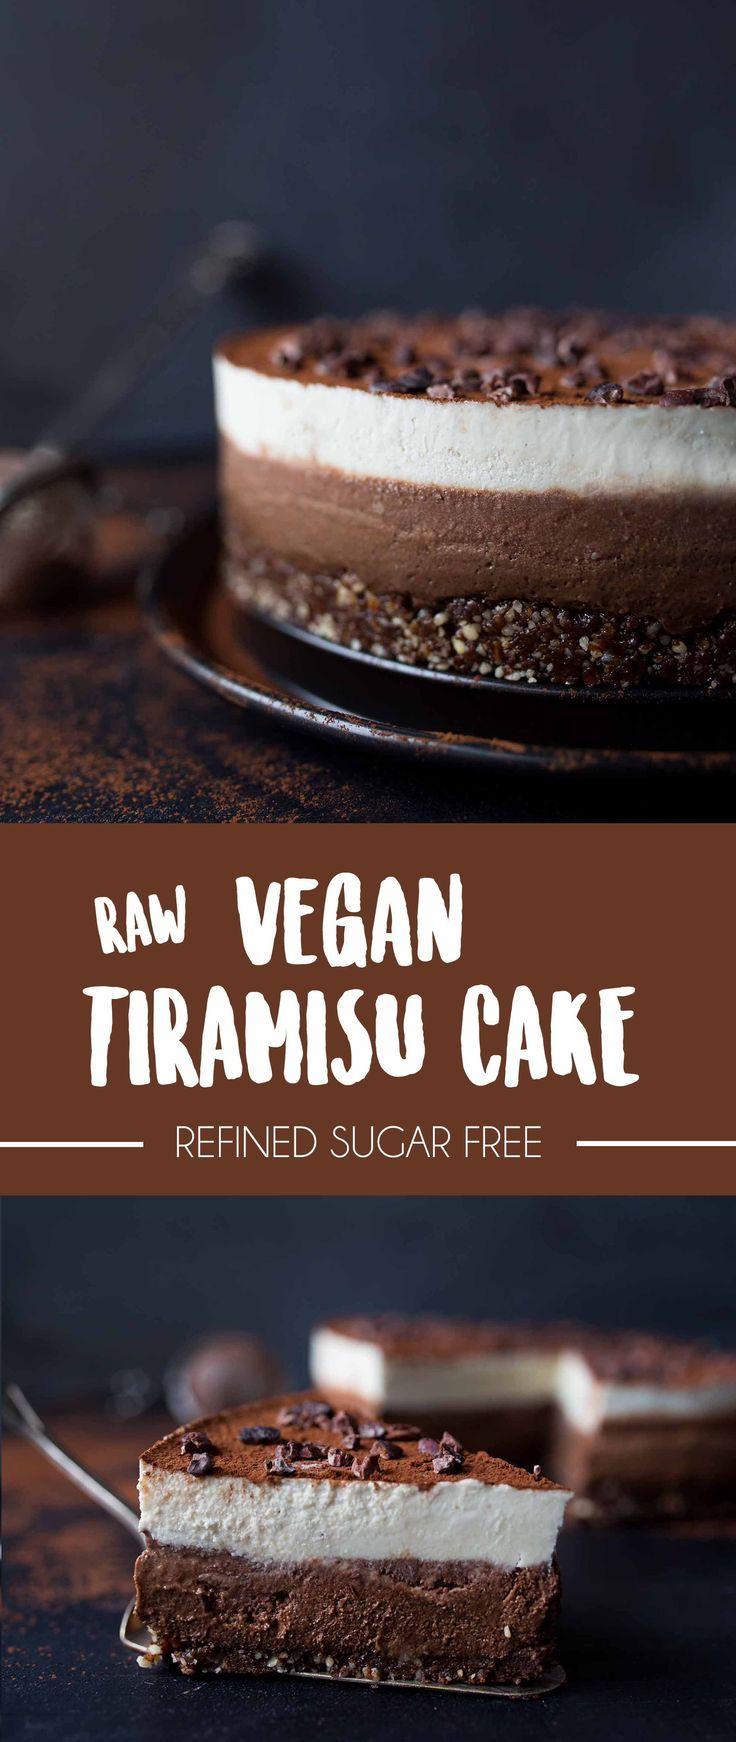 Raw Vegan Tiramisu Cake | No refined sugar | Italian friends approved!